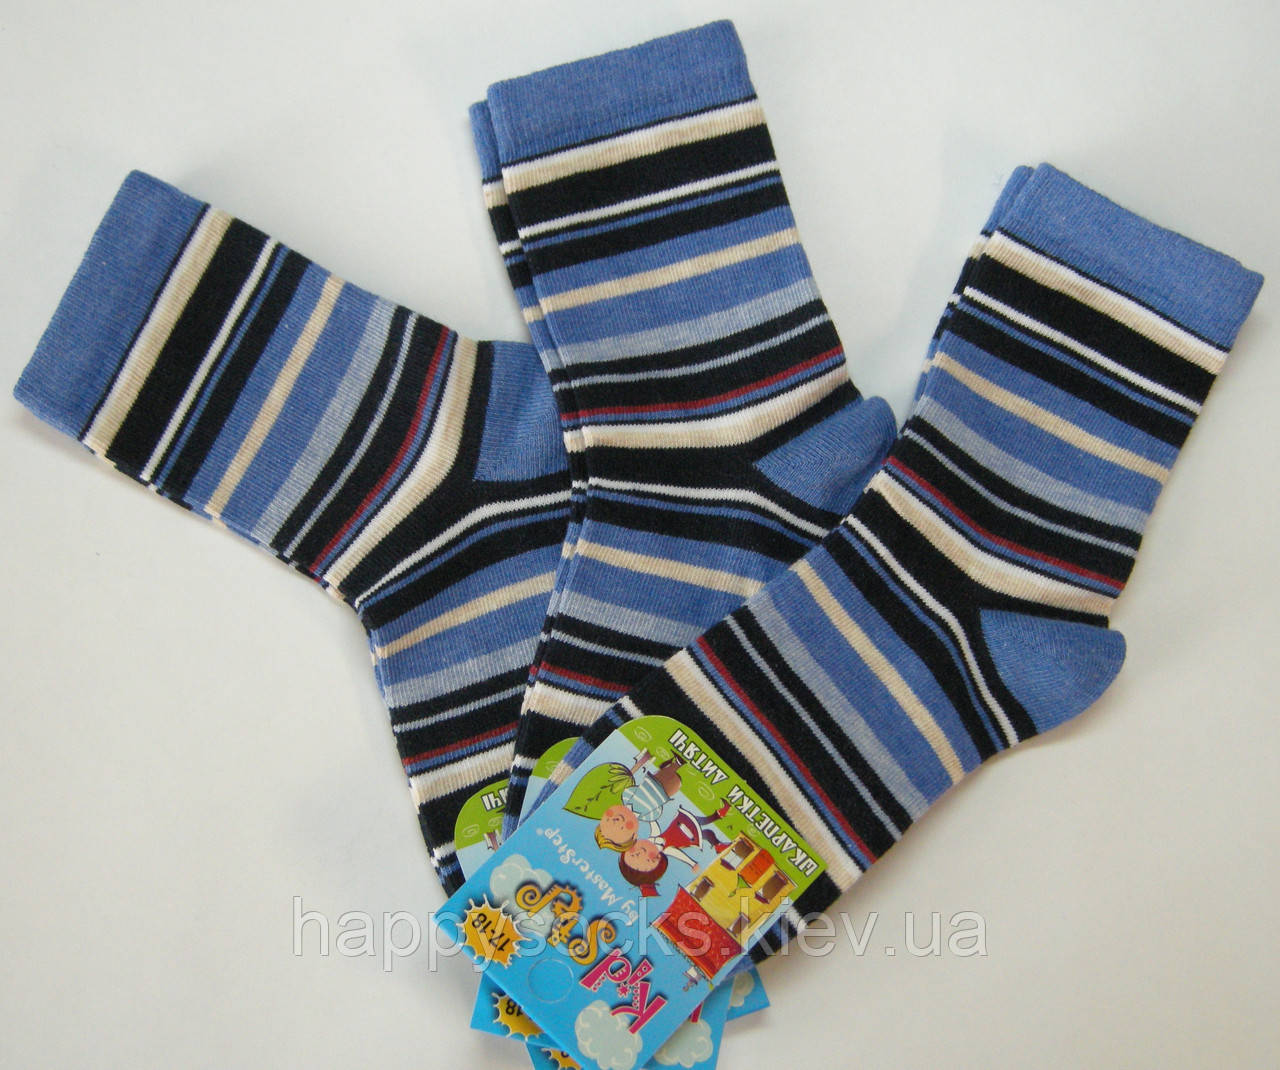 Детские носки в полоску синие